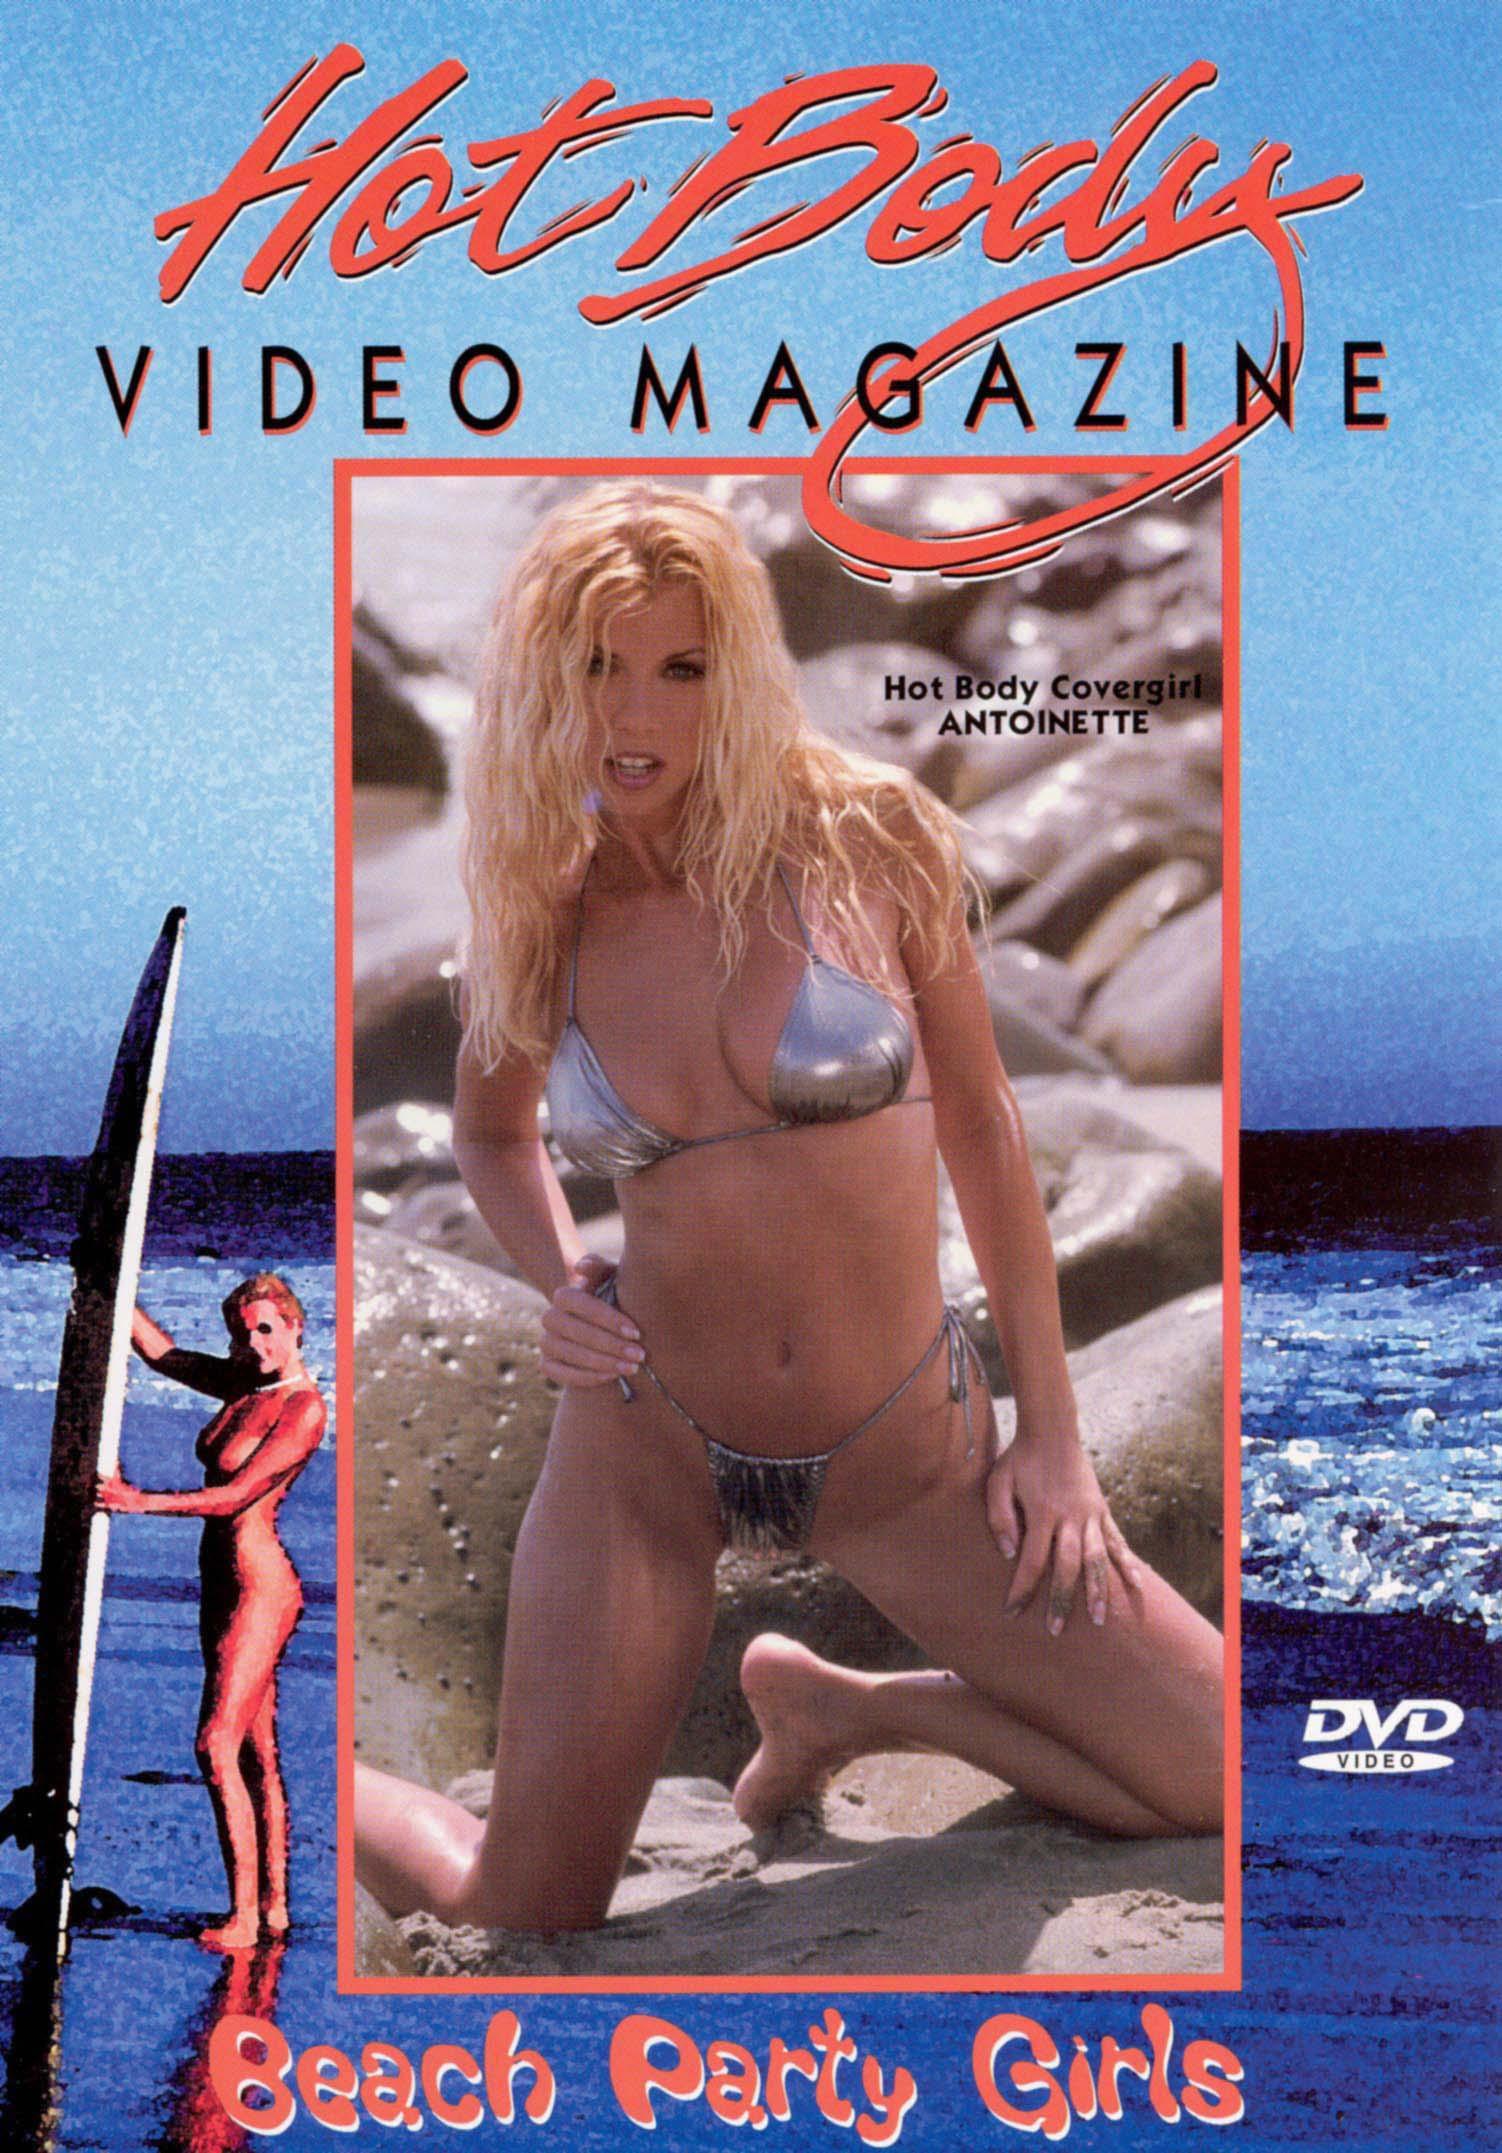 Hot Body Video Magazine: Beach Party Girls